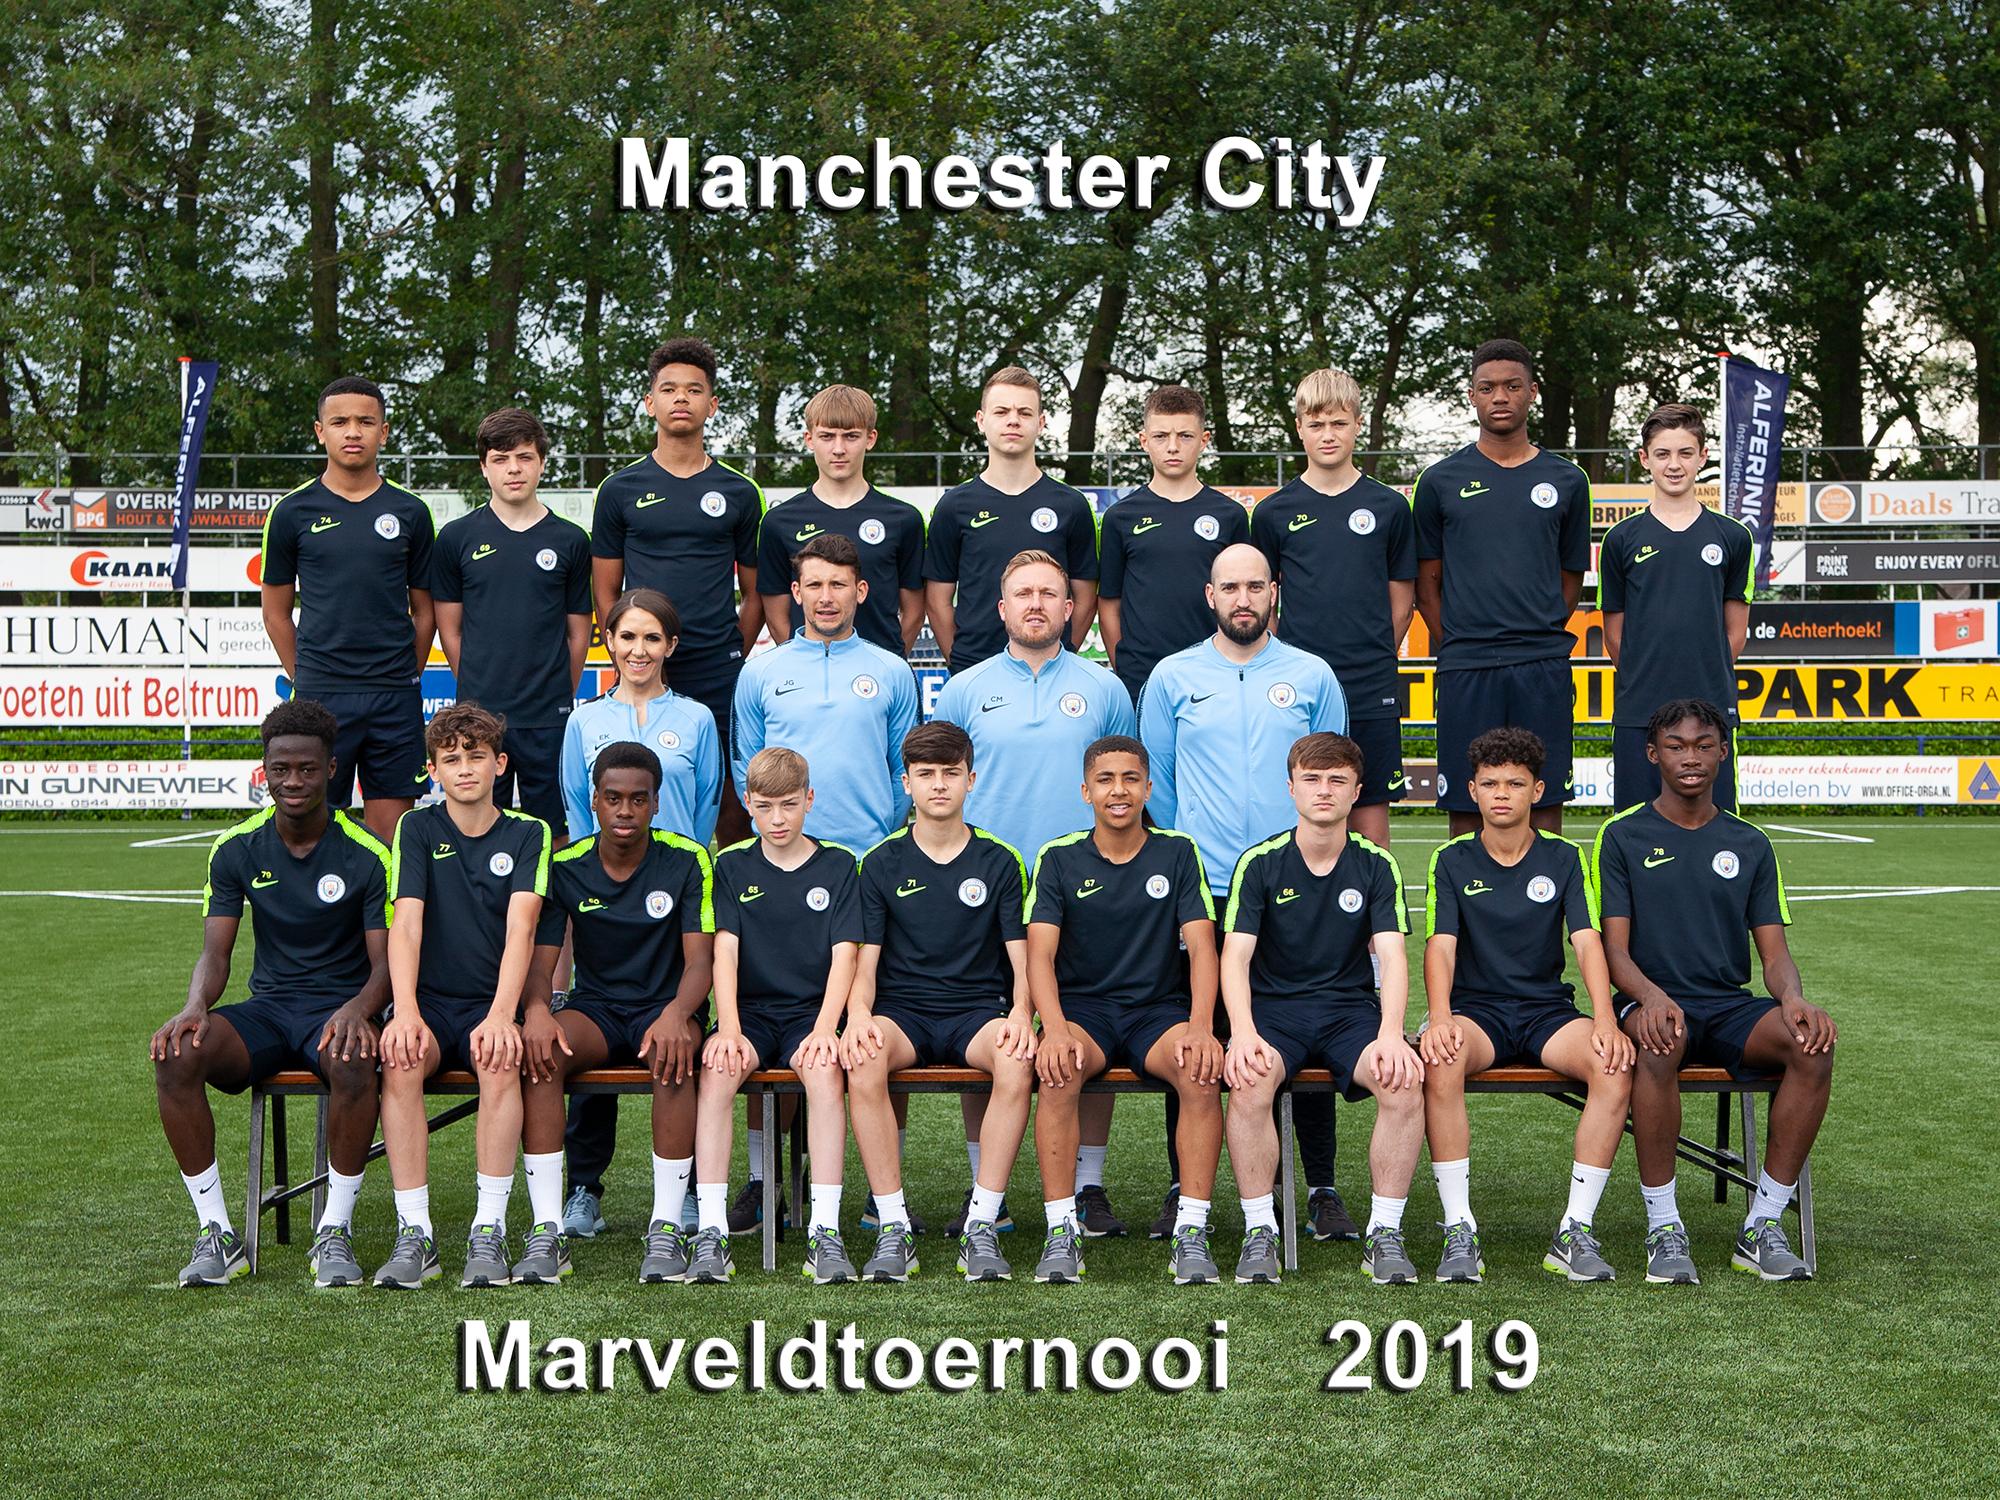 Marveld Tournament 2019 - Team Manchester City